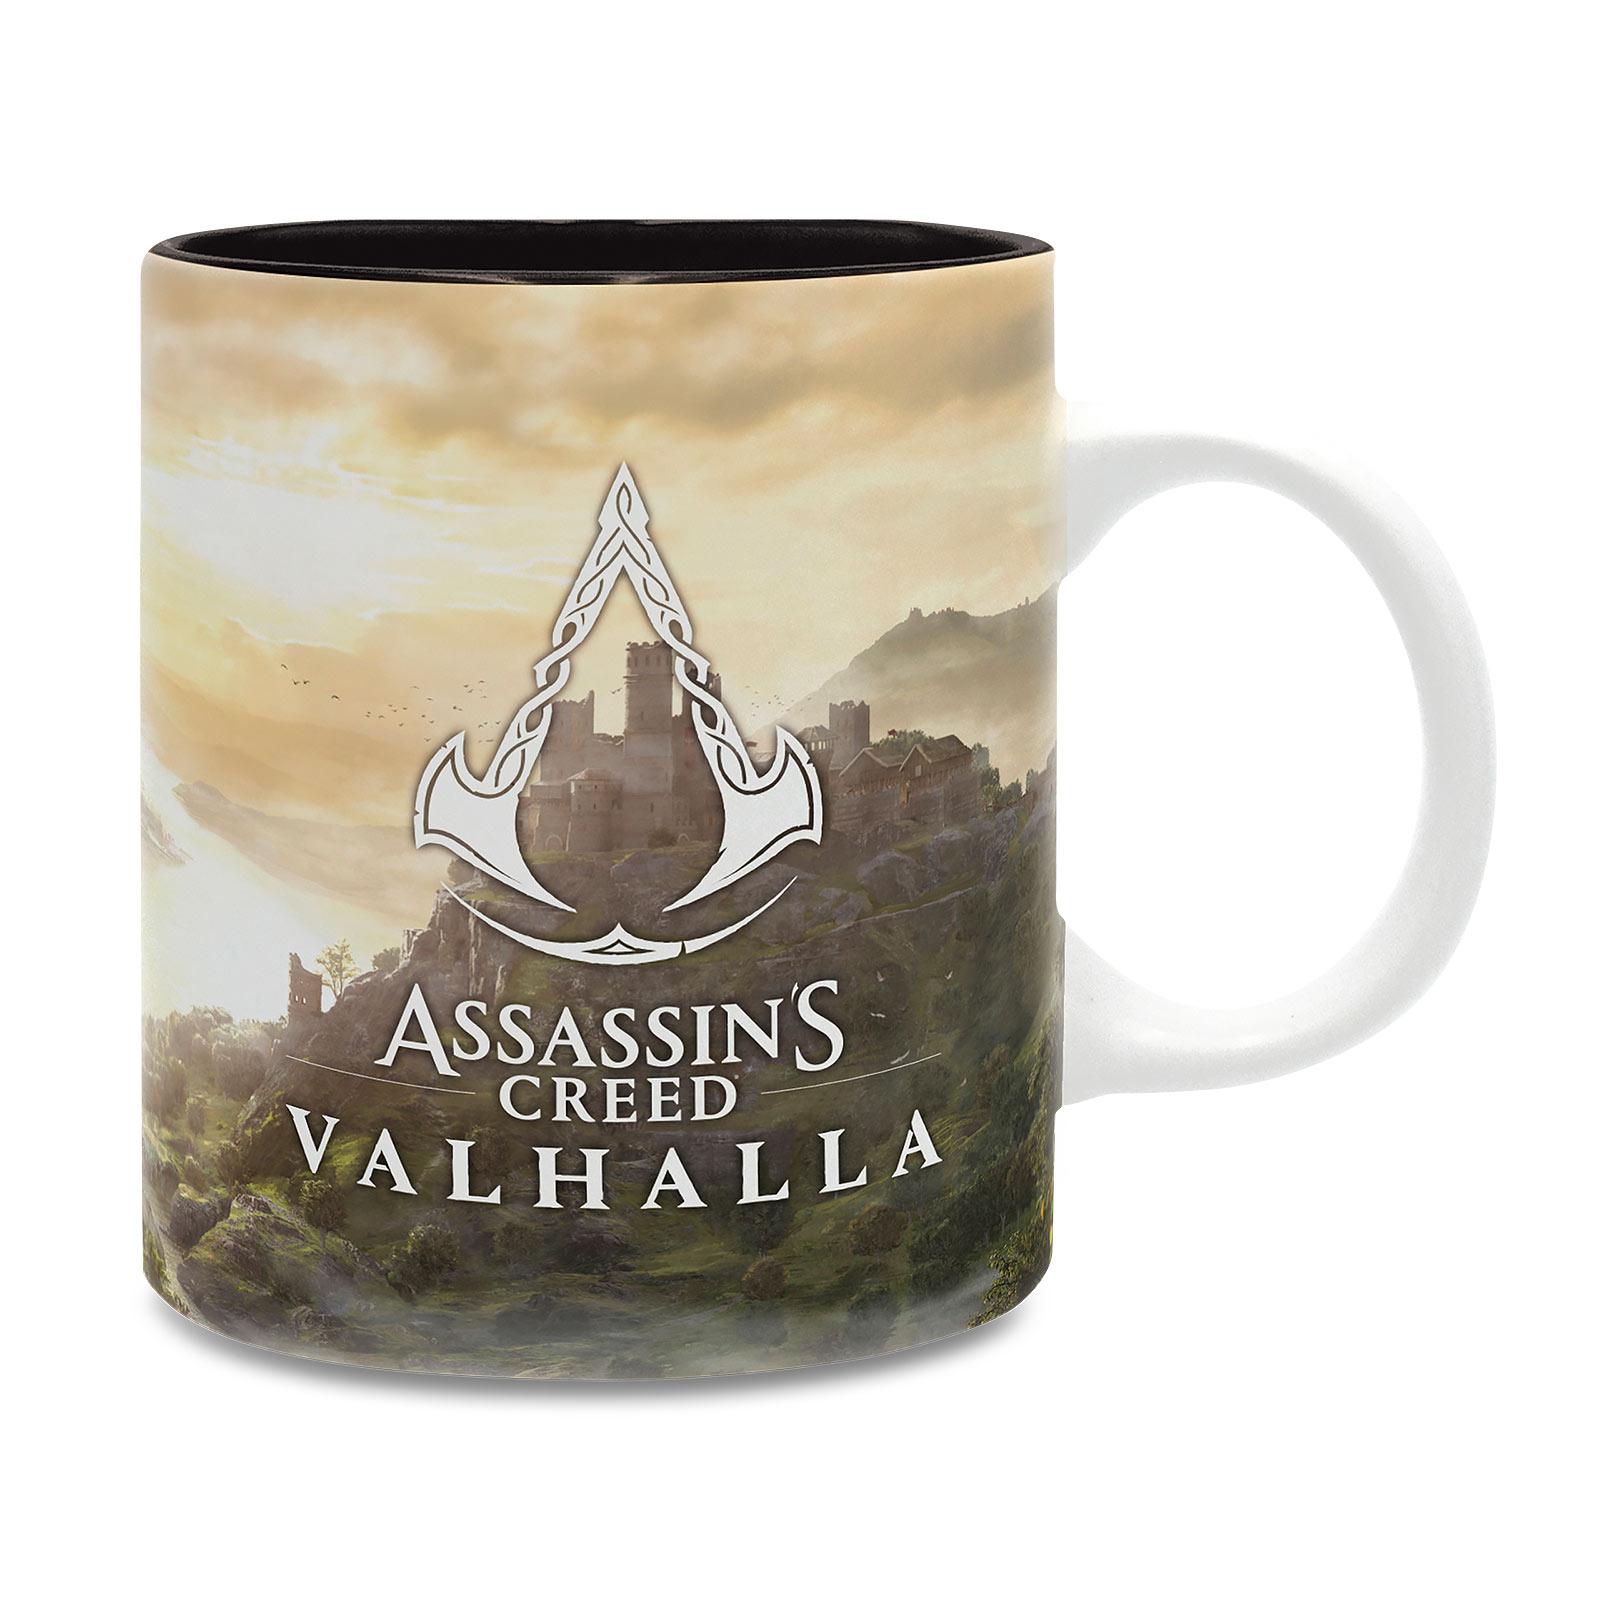 Assassin's Creed - Valhalla Landscape Tasse